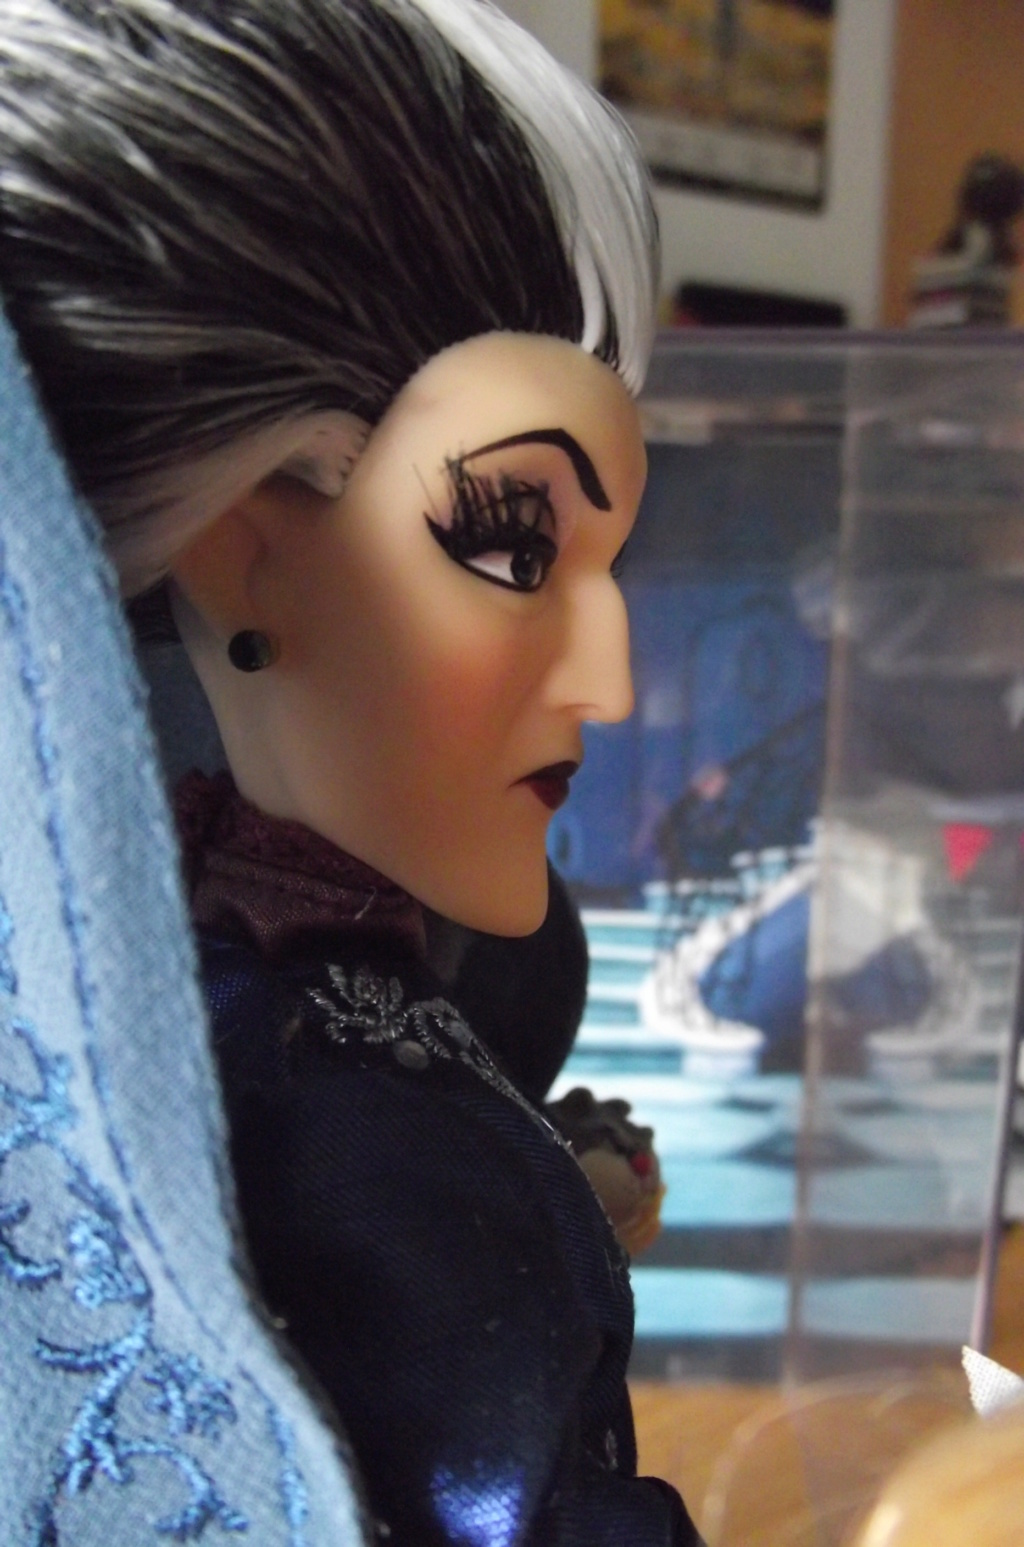 Disney Fairytale/Folktale/Pixar Designer Collection (depuis 2013) - Page 13 Dscf1939